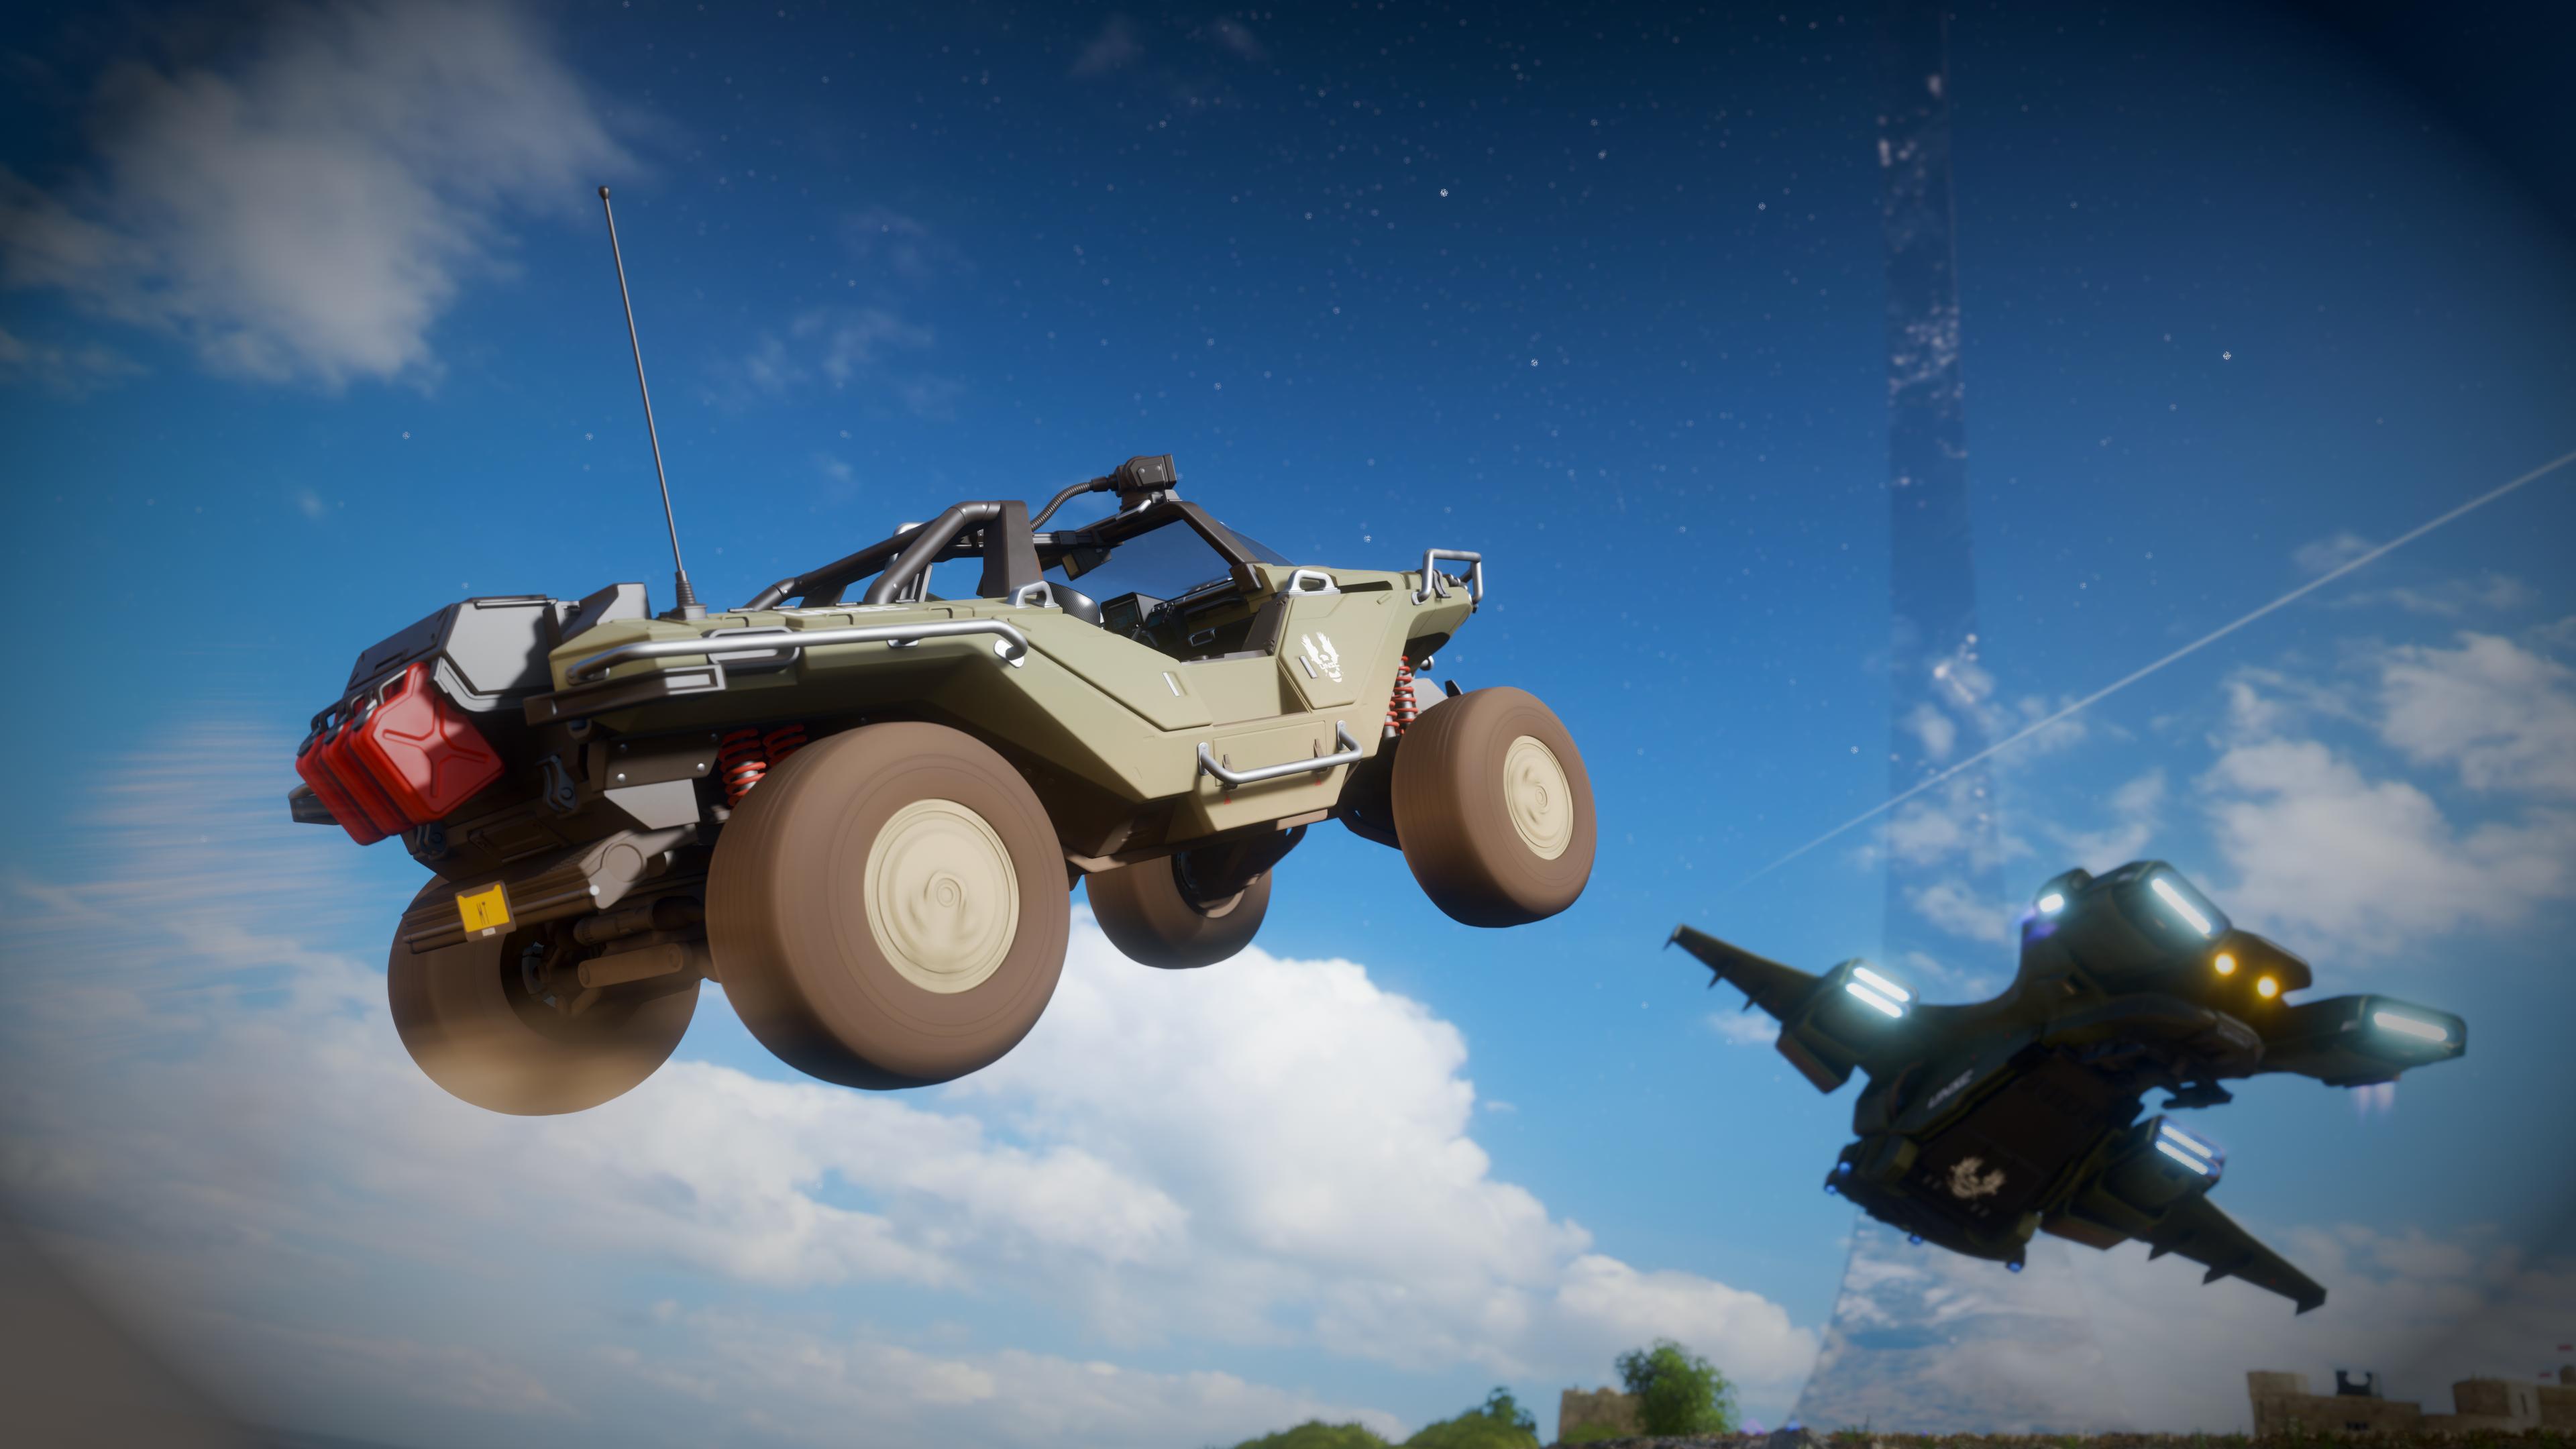 General 3840x2160 Forza Horizon 4 spring Halo screen shot video games car